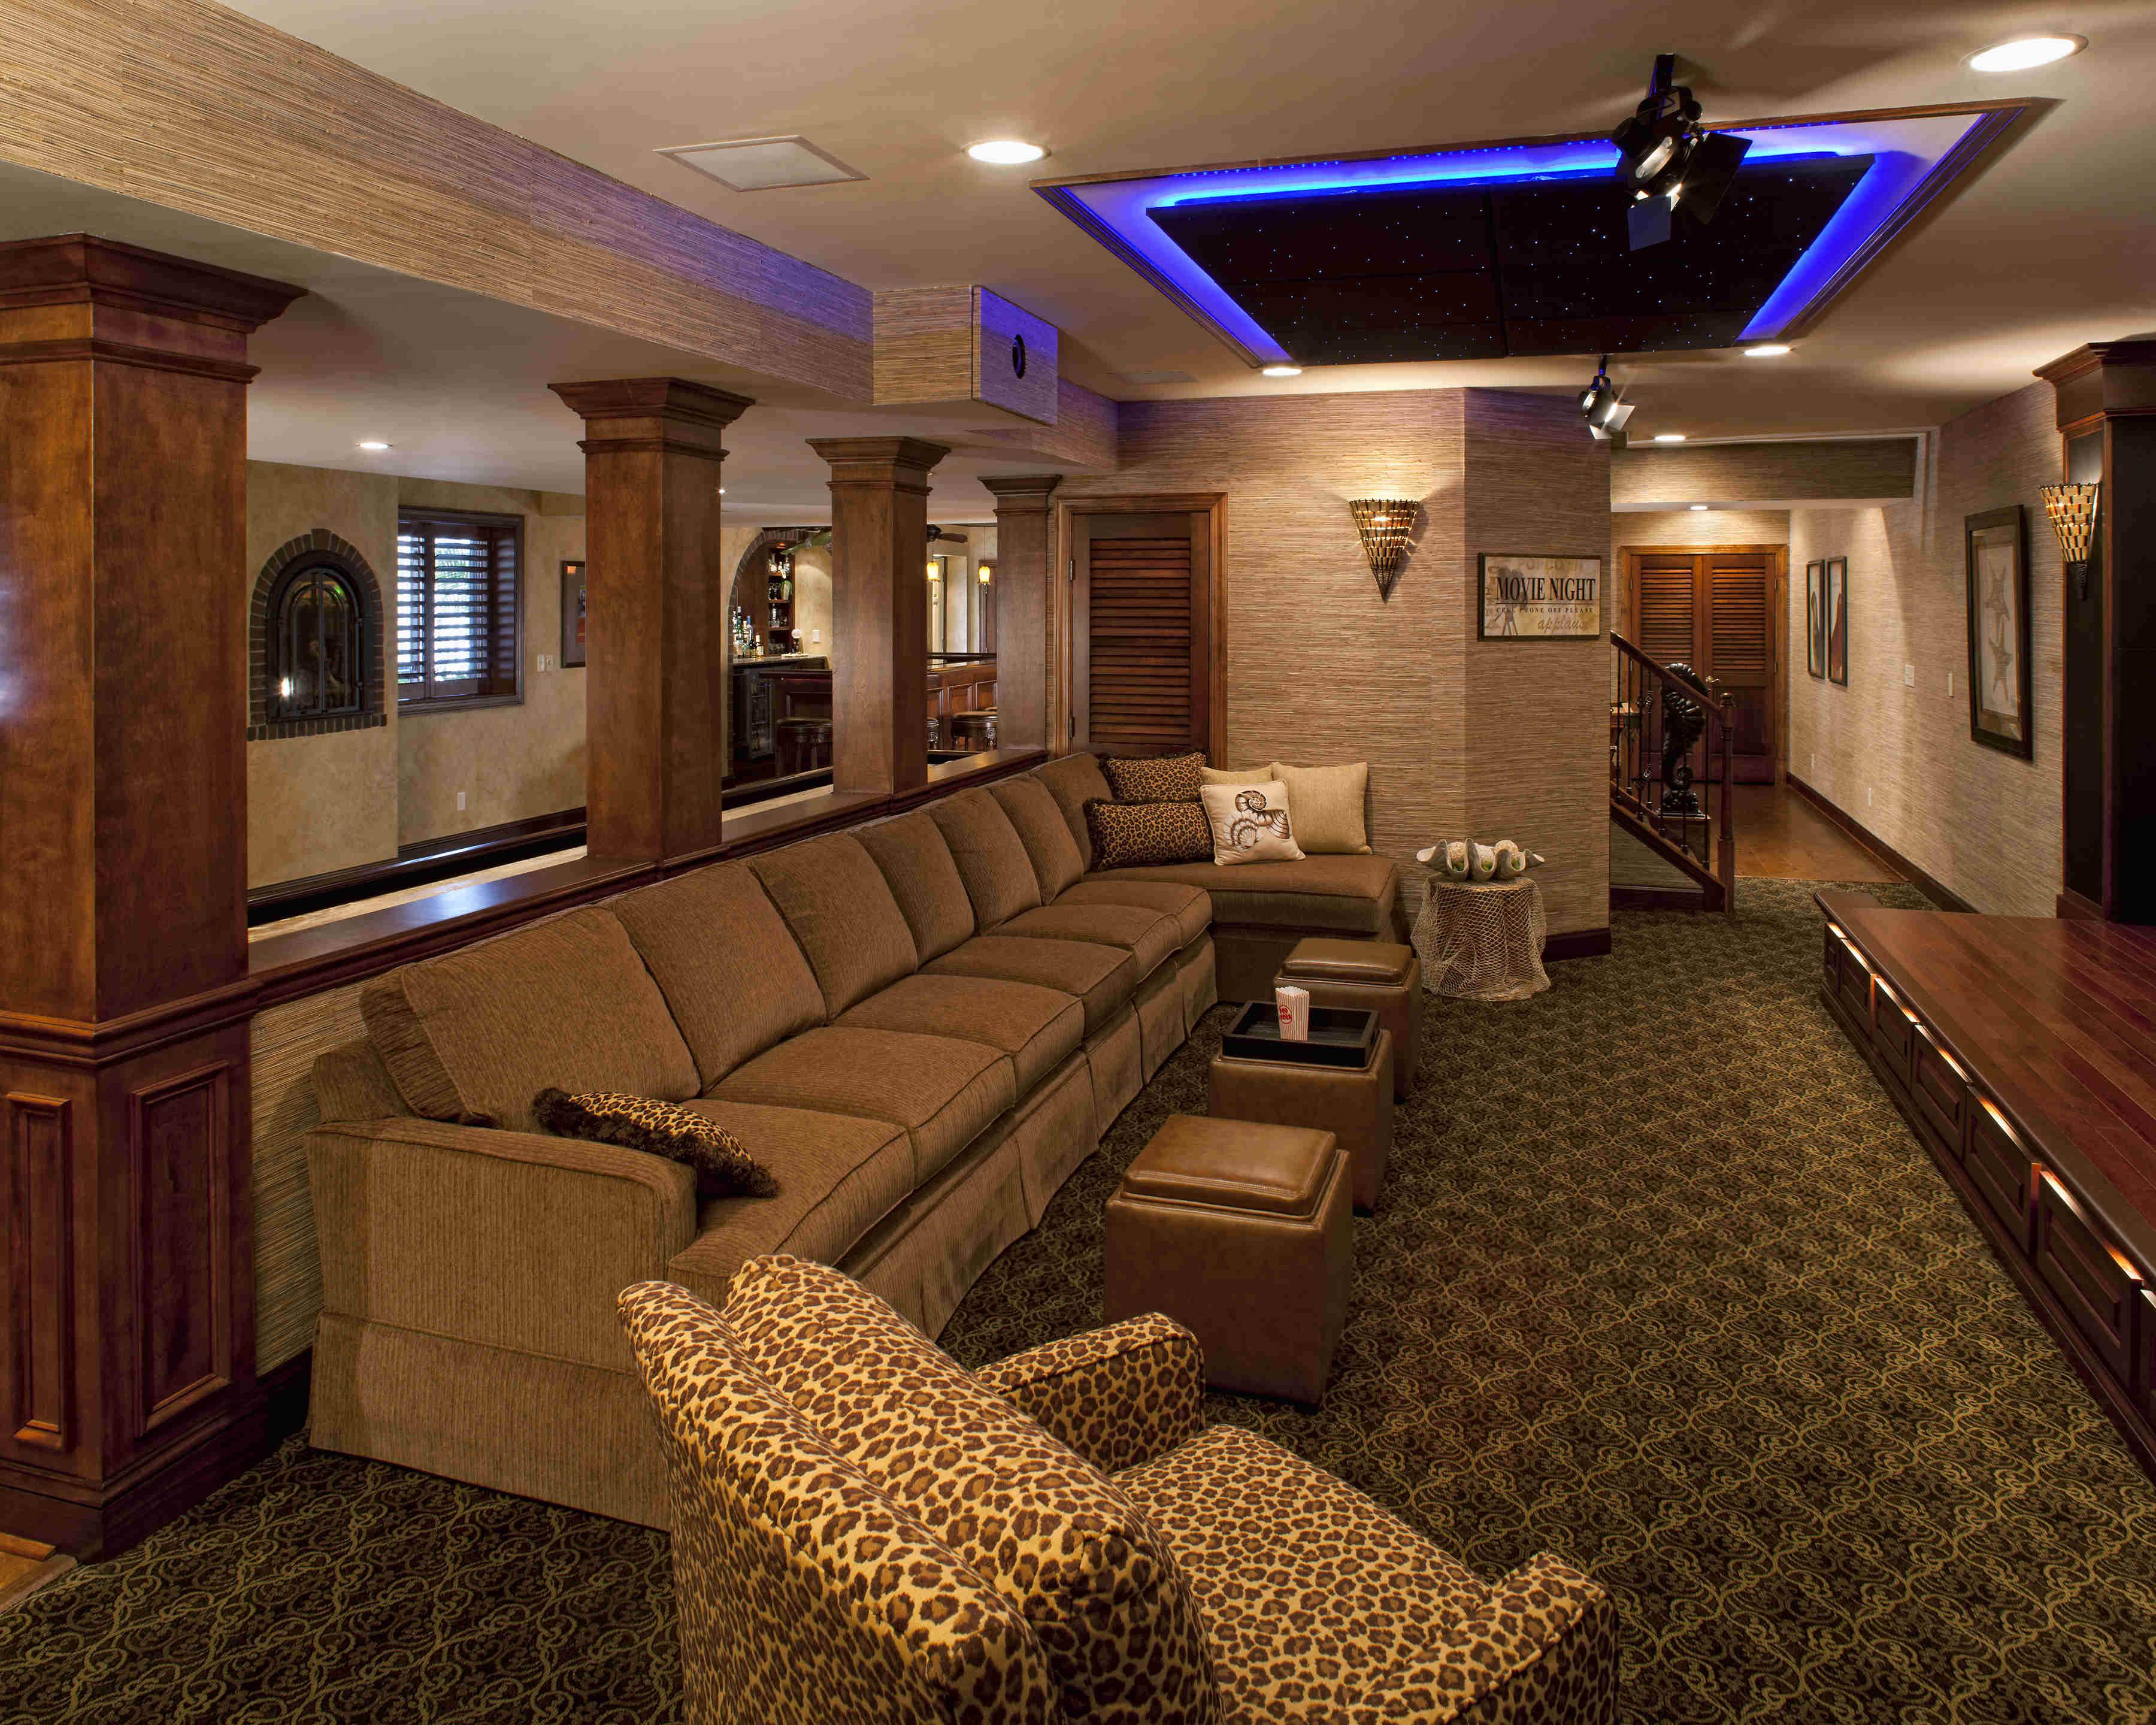 Custom Home Movie Theater Design Photos Gallery - Cinema | Ideas